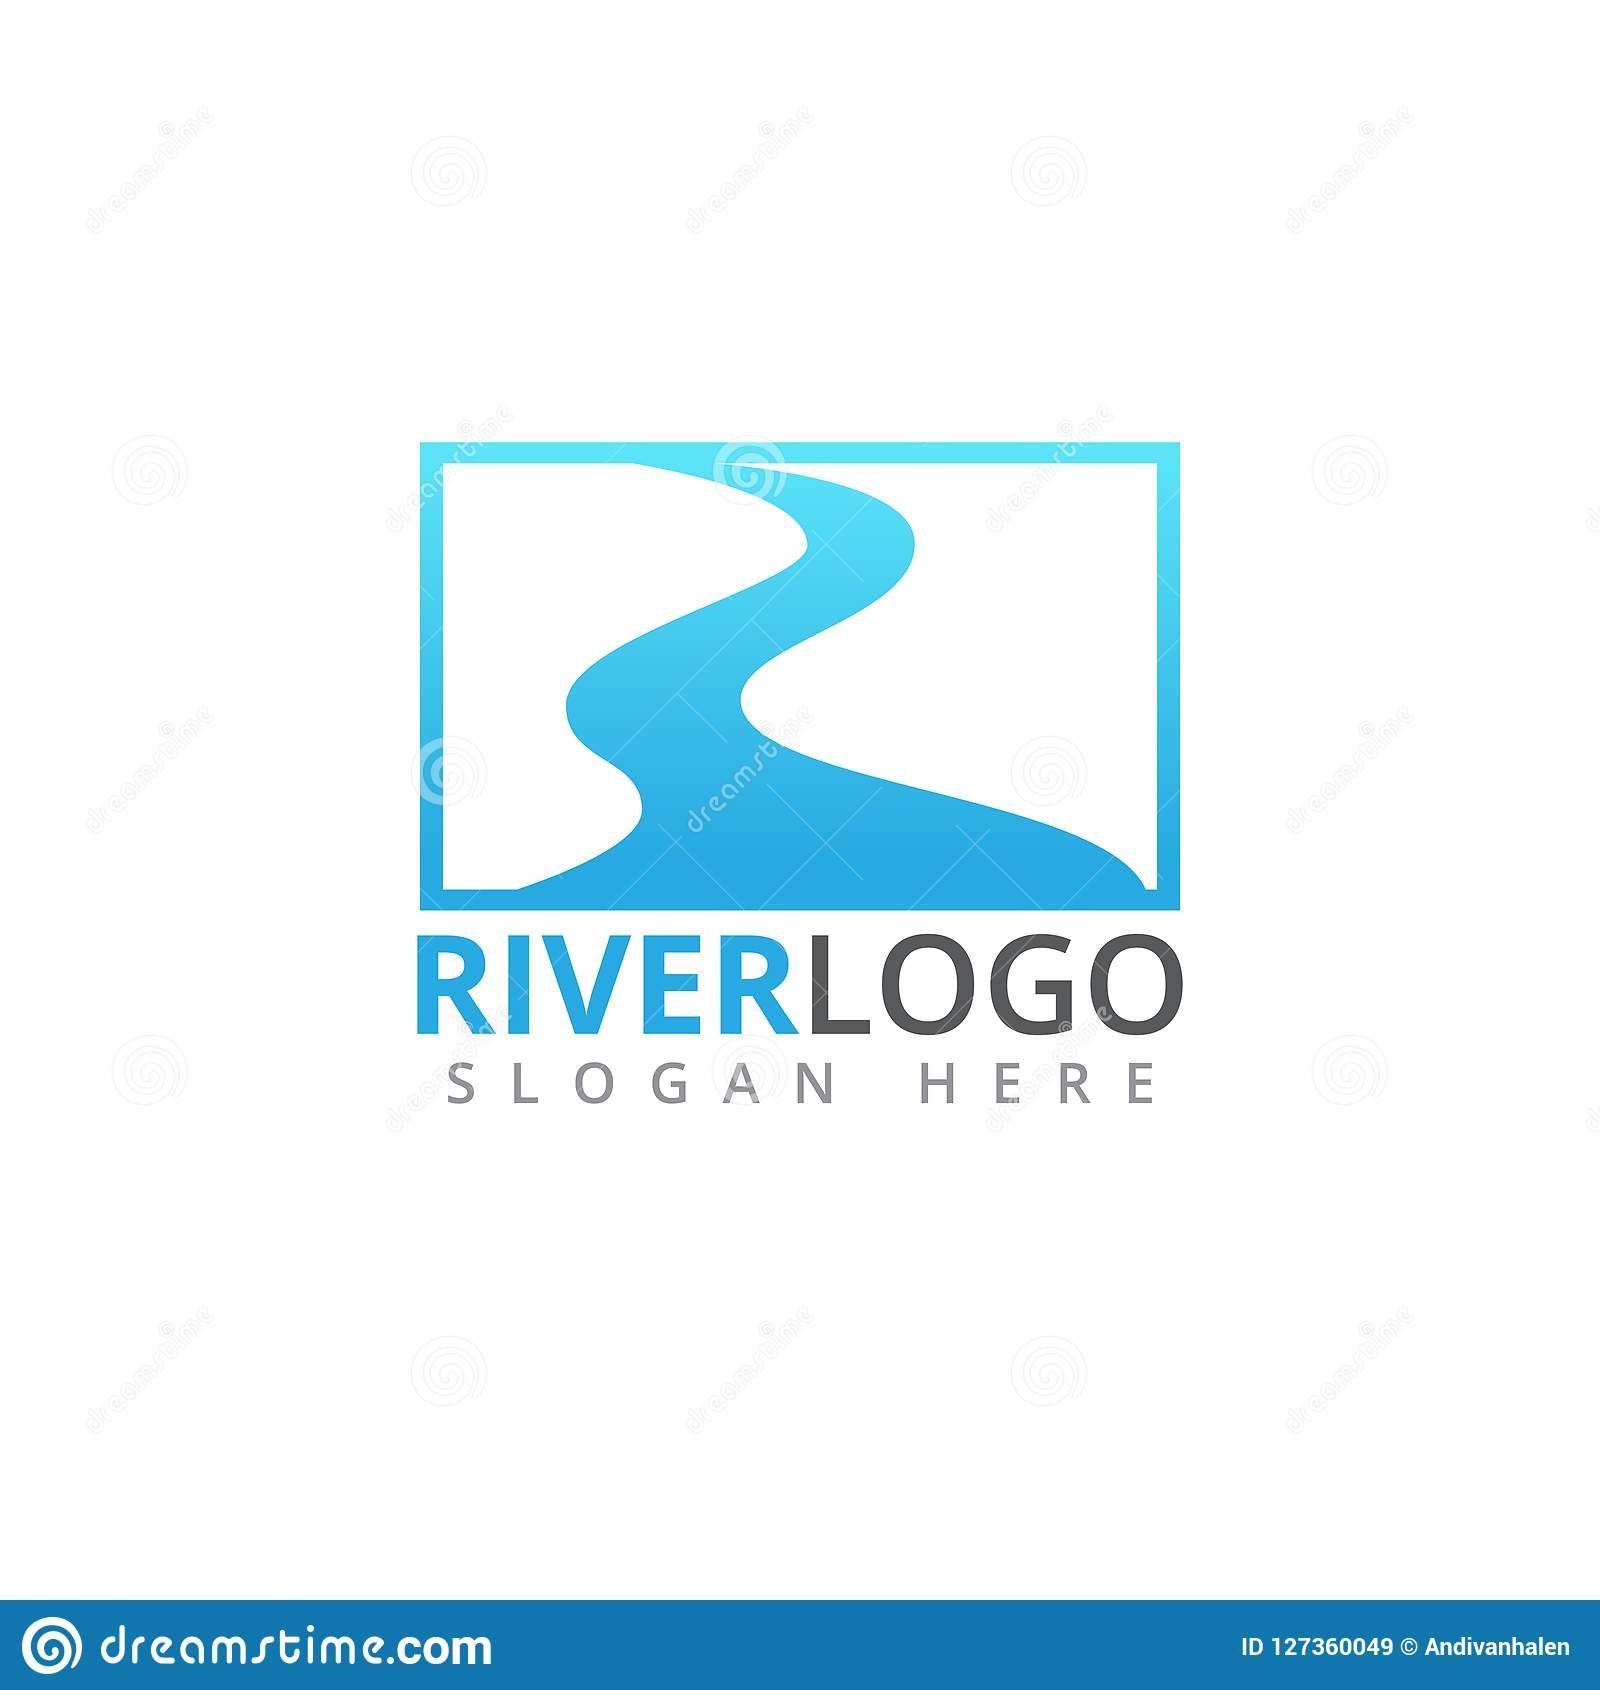 river stream flowing shape vector logo design stock illustration illustration of simple source 127360049 https www dreamstime com river stream flowing shape vector logo design abstract template image127360049